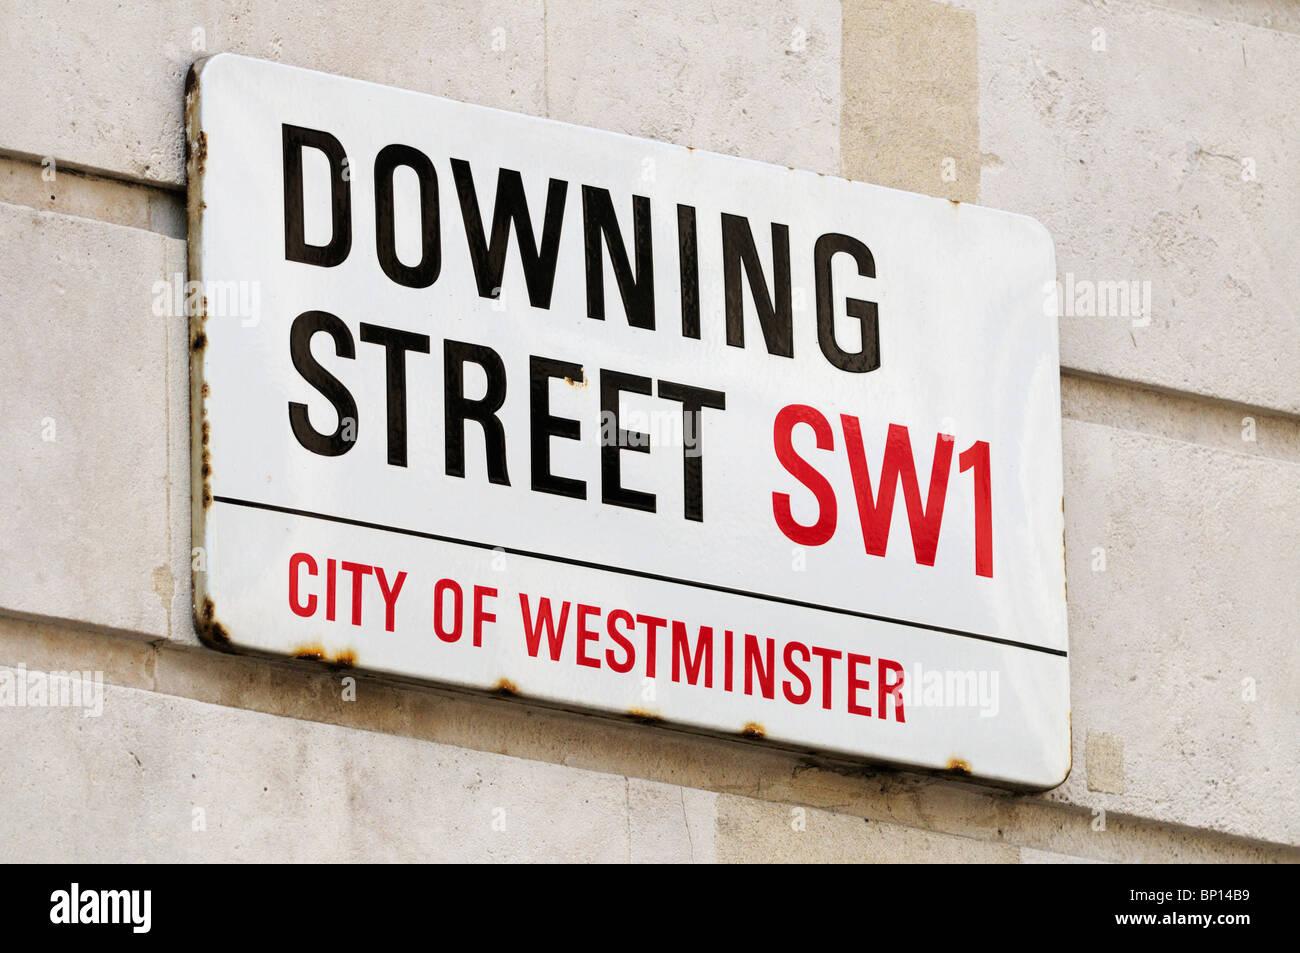 Downing Street Sign, London, England, UK - Stock Image